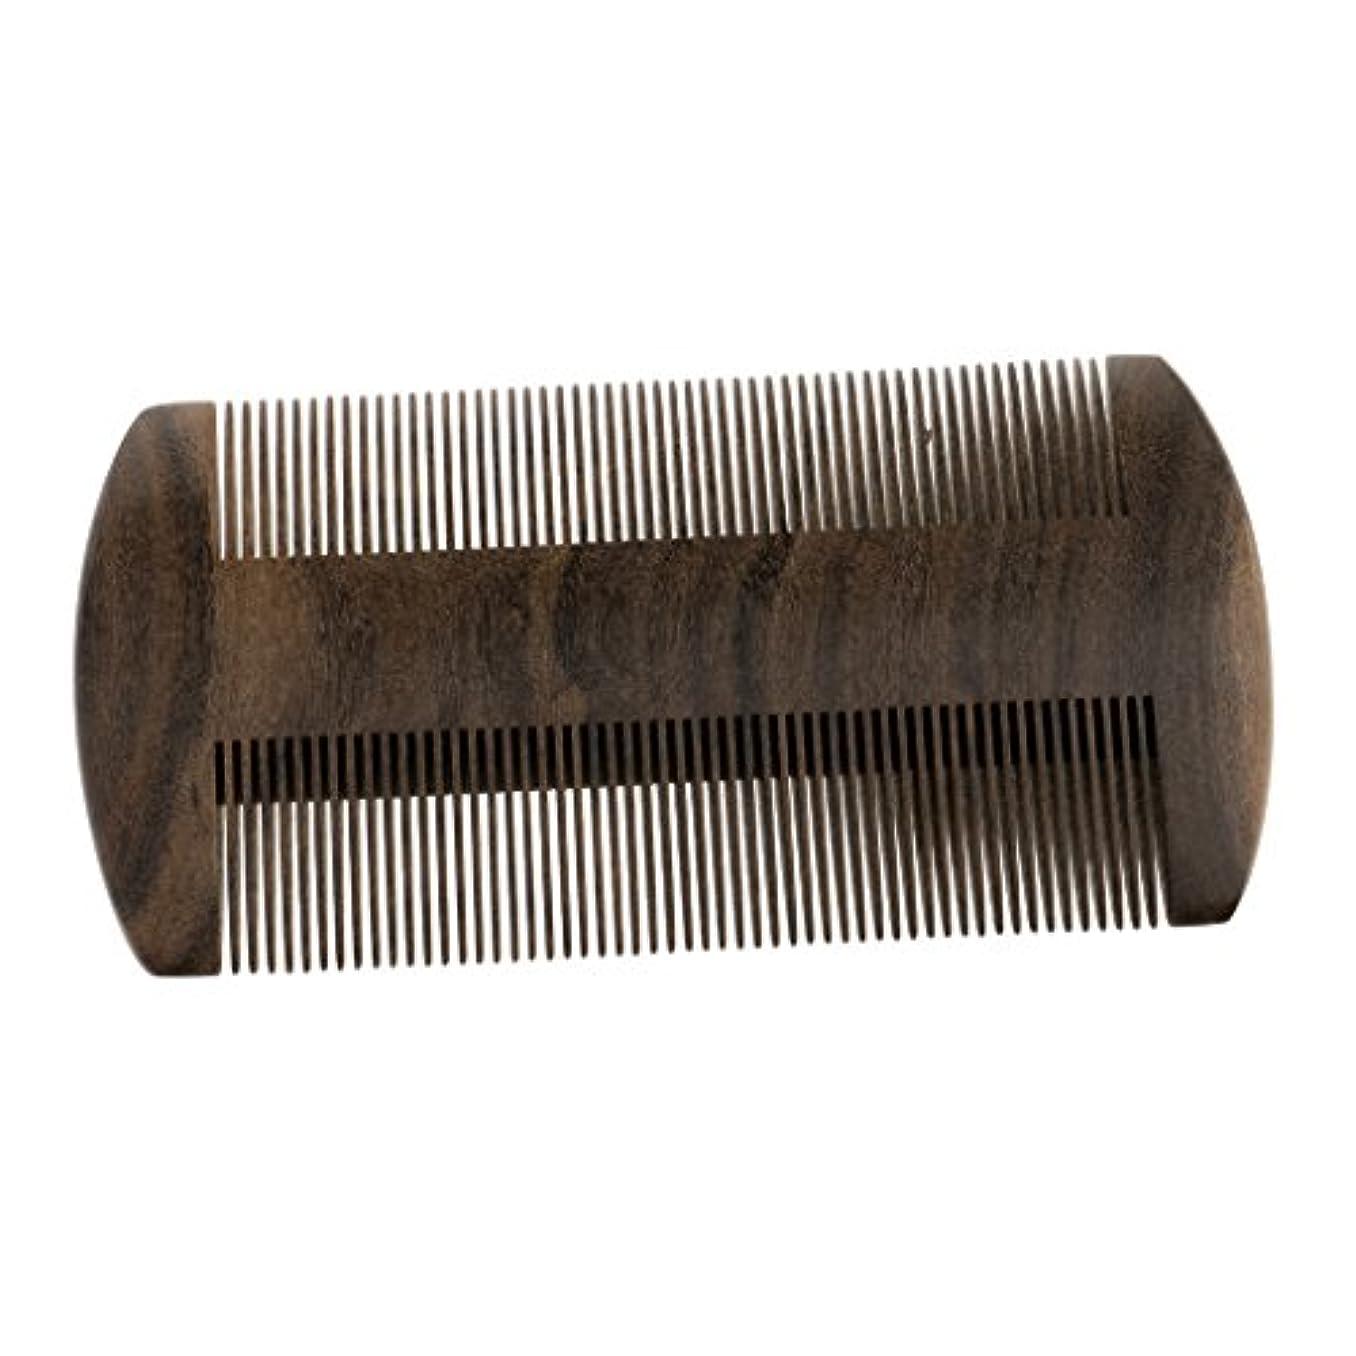 DYNWAVE ヘアダイコーム ウッドコーム ヘアブラシ 静電気防止 髭剃り櫛 ブラシ ポケットコーム